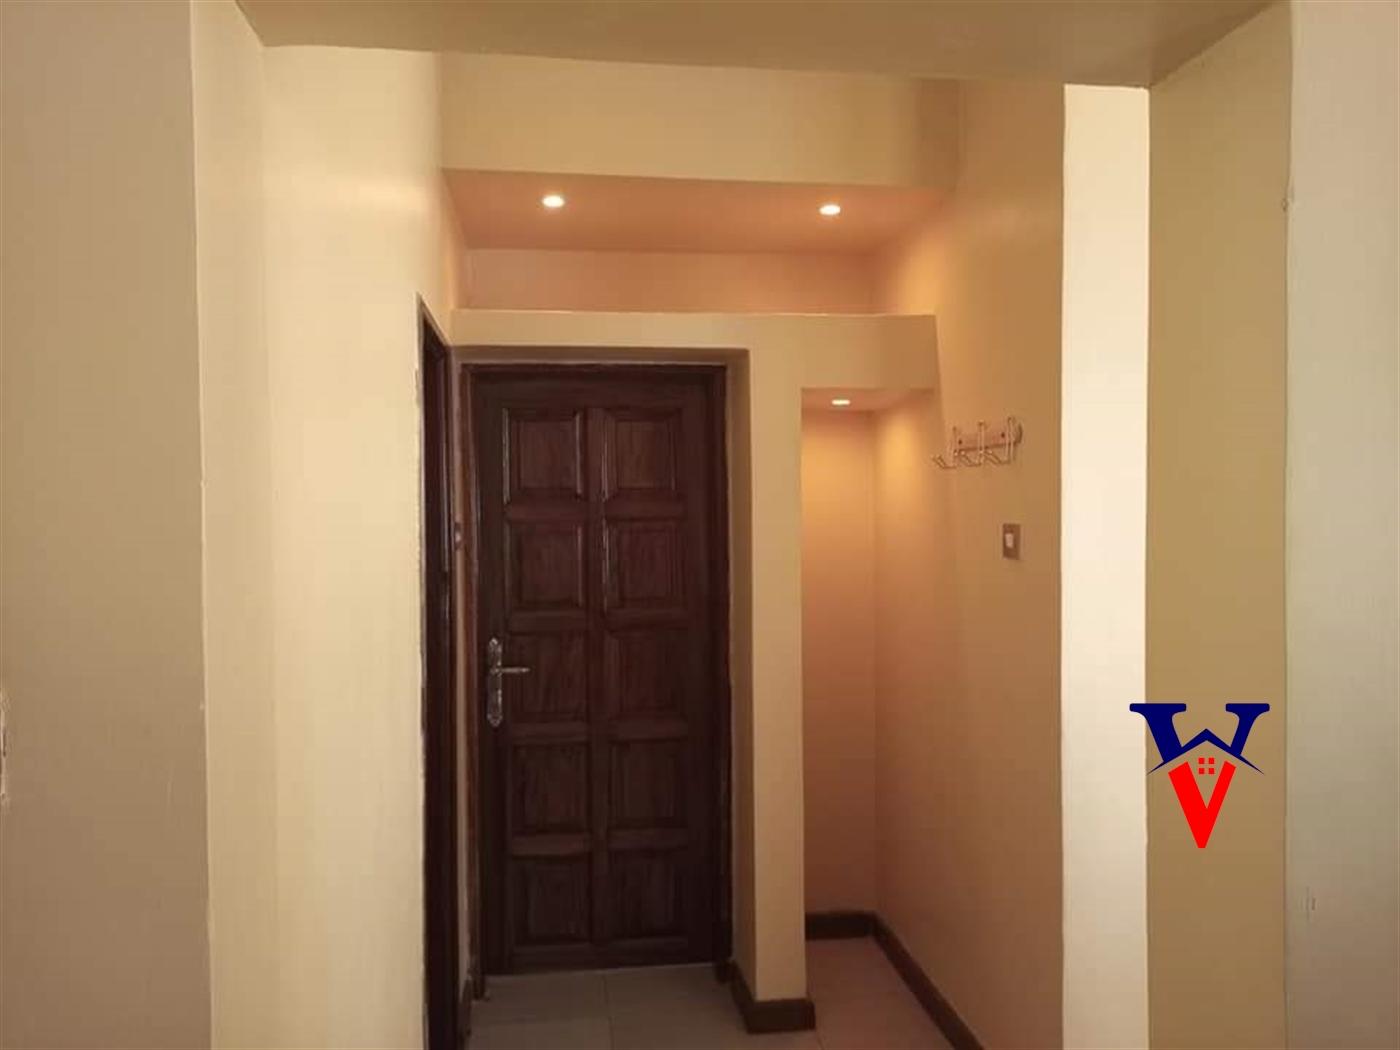 Villa for rent in Mutungo Kampala